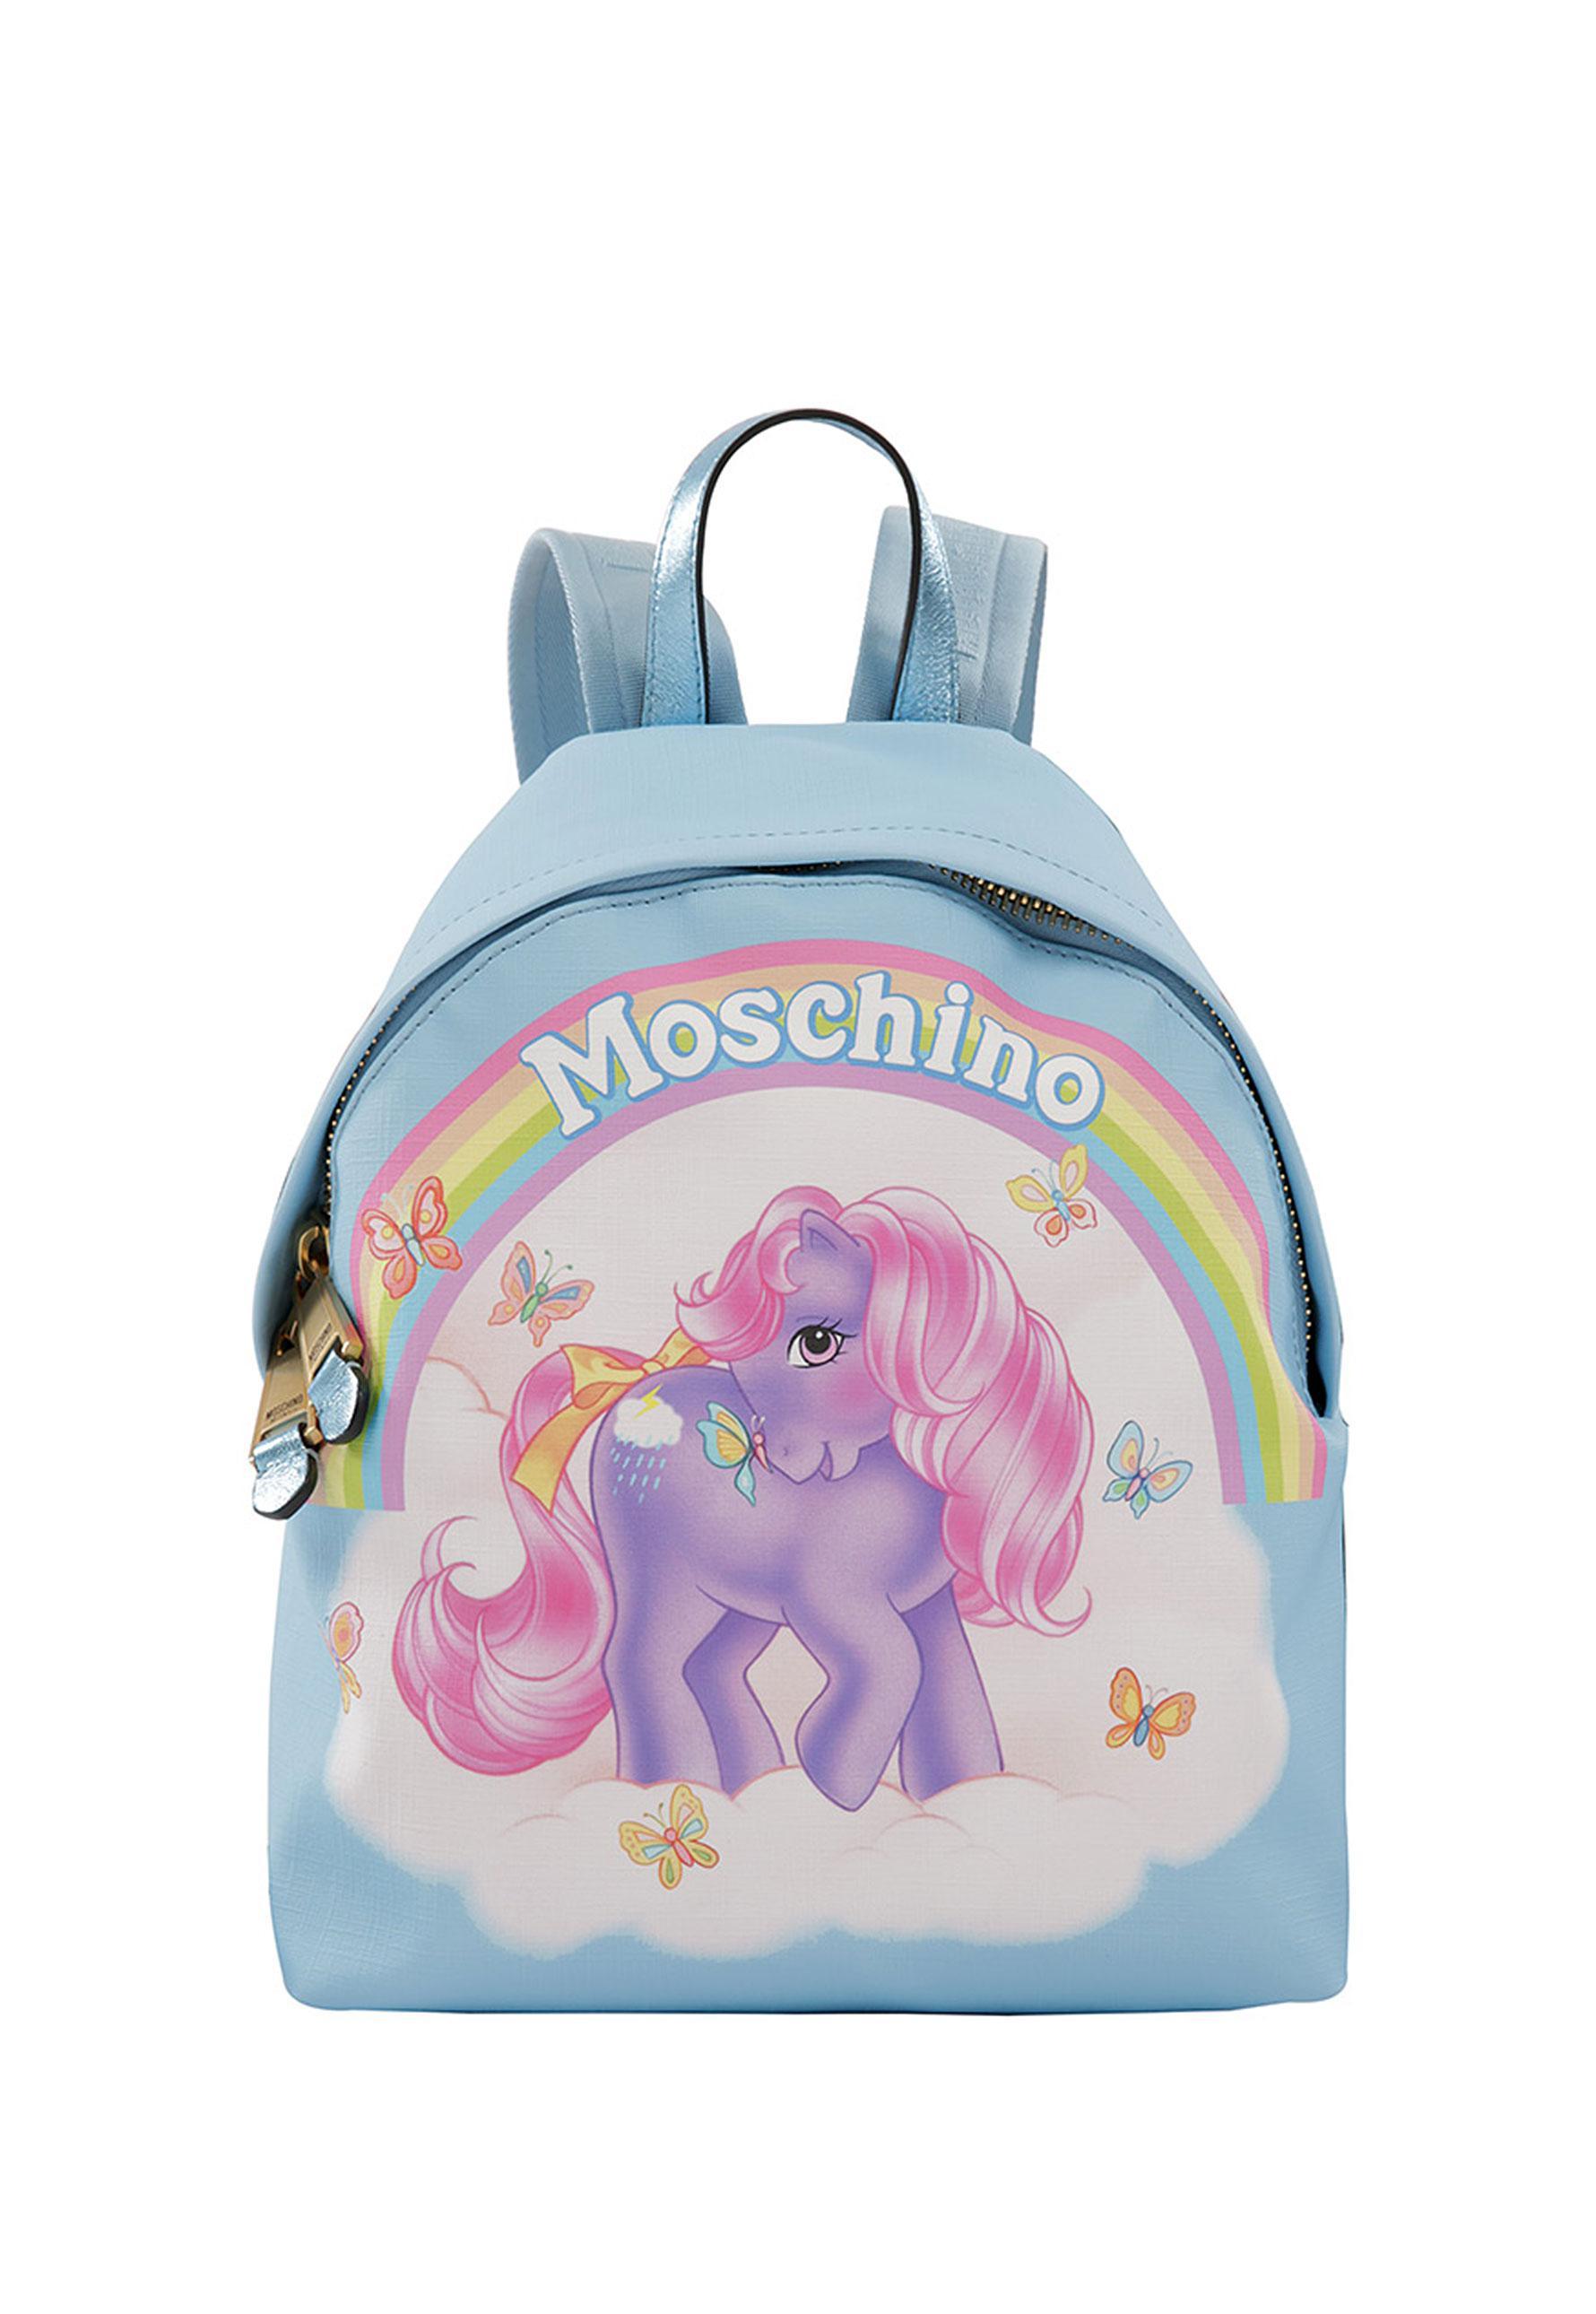 Moschino My Little Pony backpack - Pink & Purple 3zo93